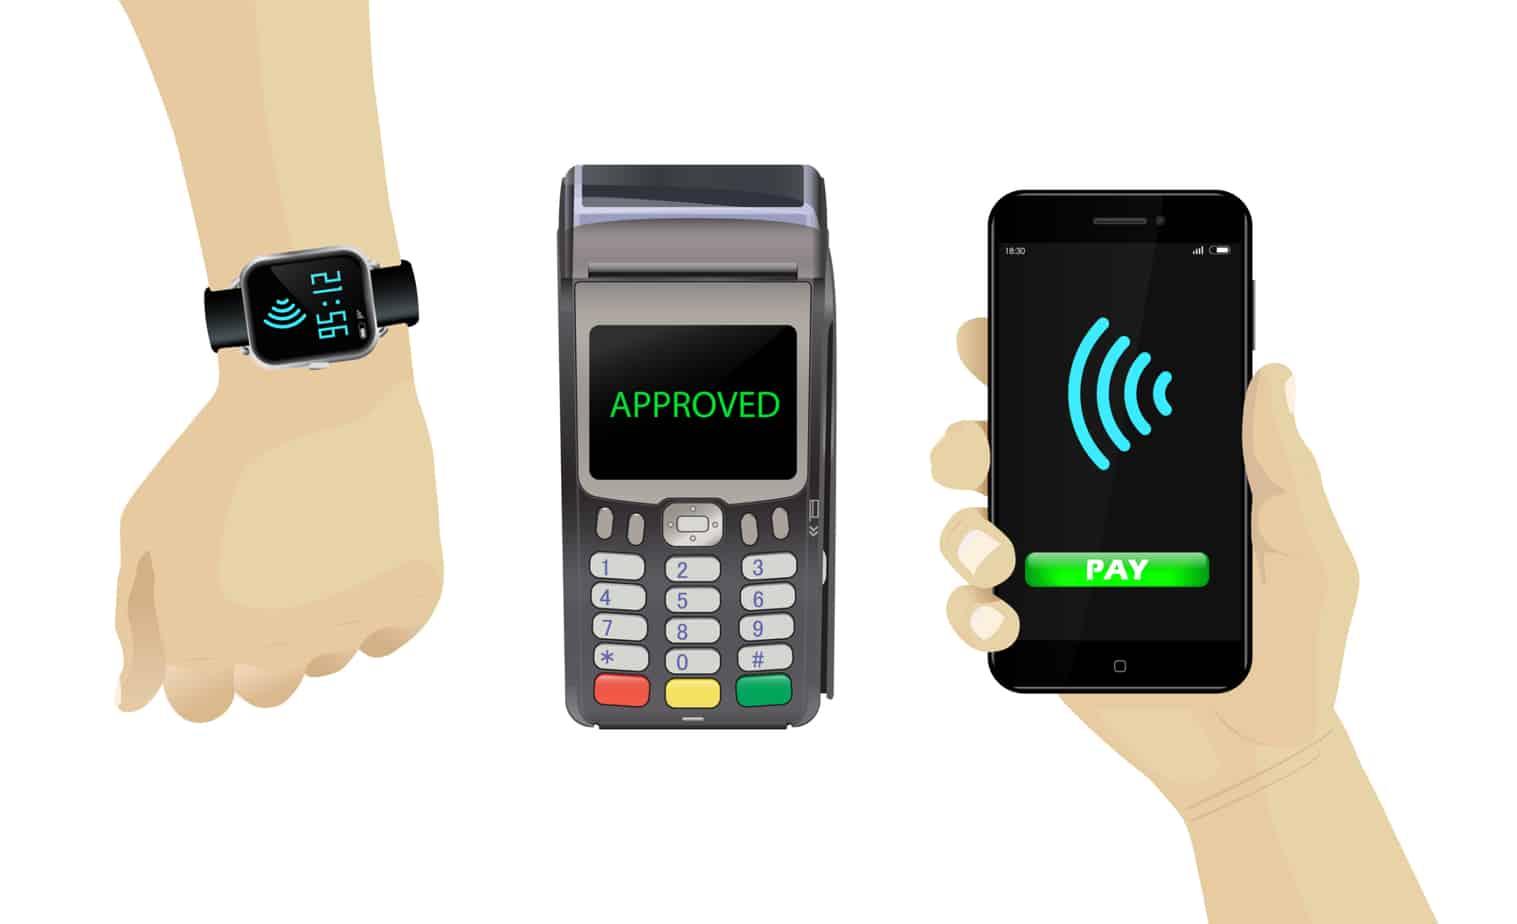 pos terminal smartphone smartwatch contactless payments set 103888539